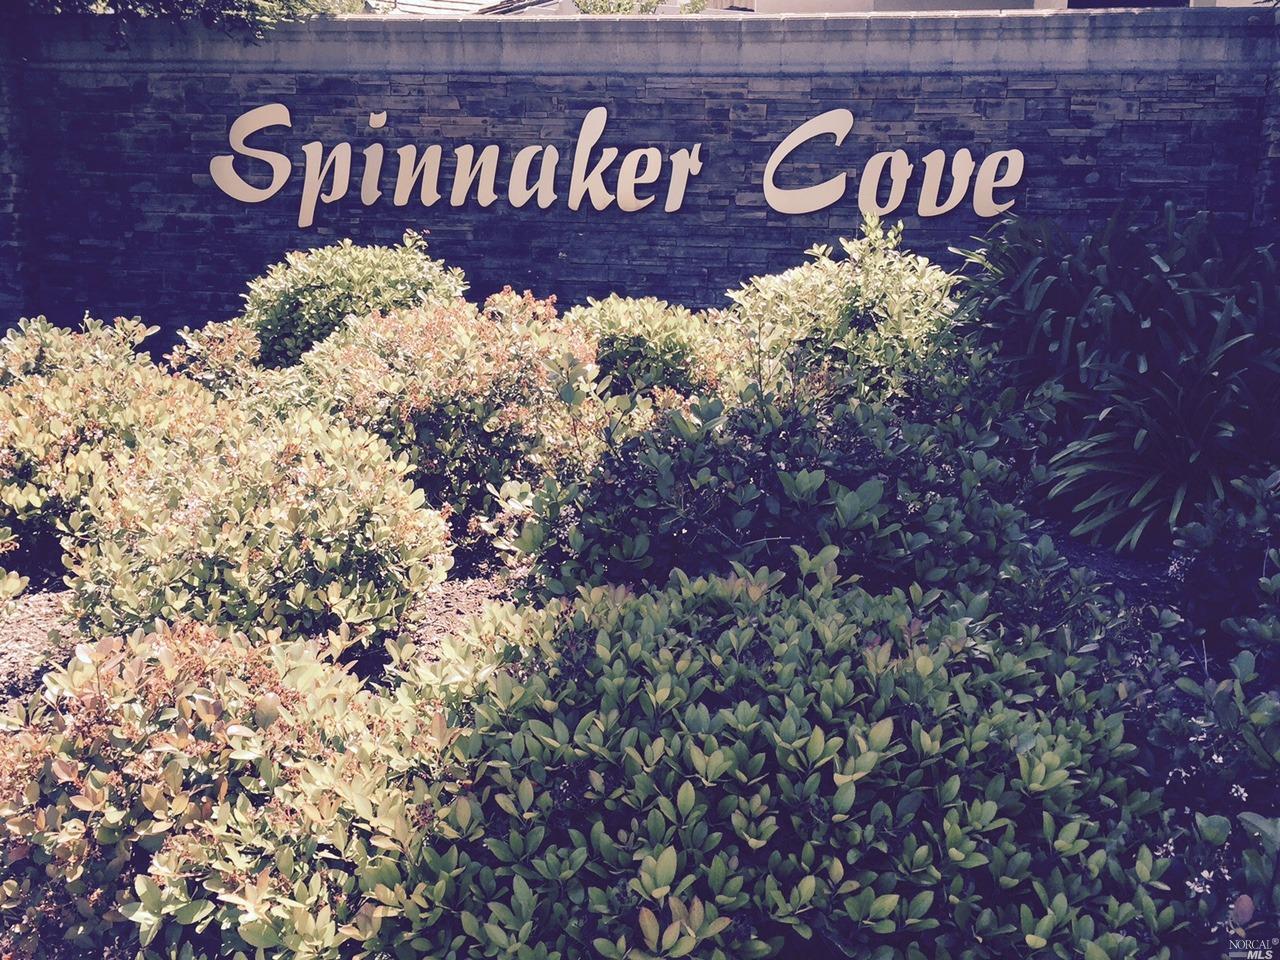 425 Marvin Gardens Dr, Vacaville, CA